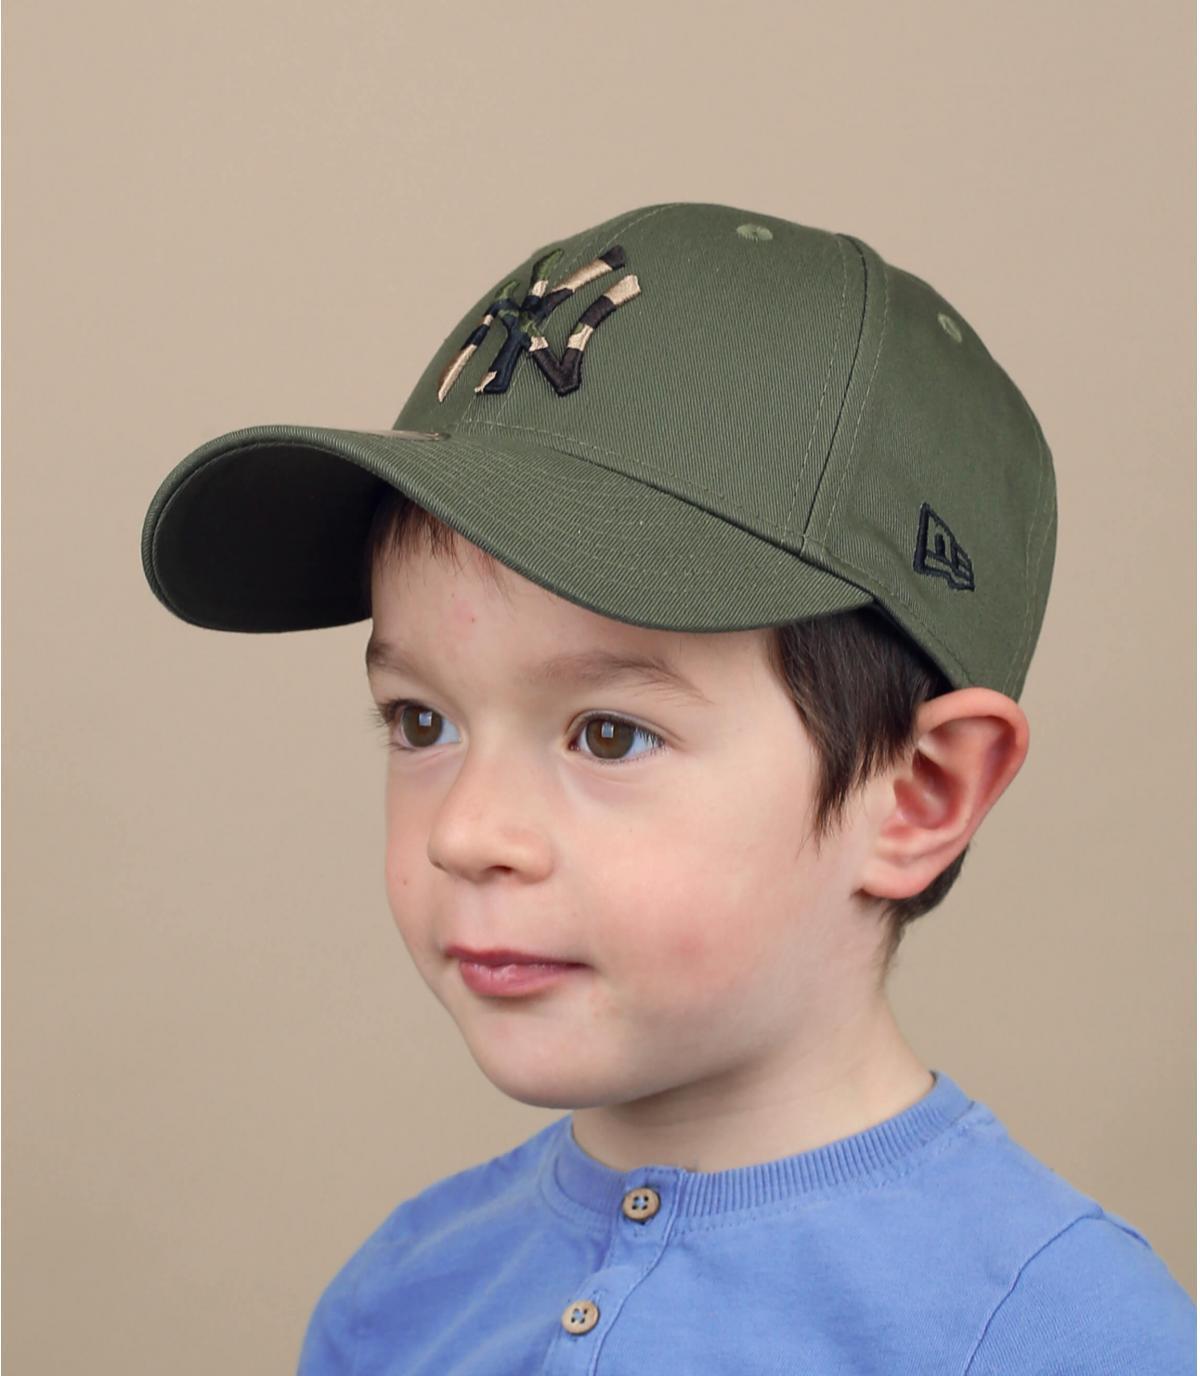 Kinder Cap NY grün camo